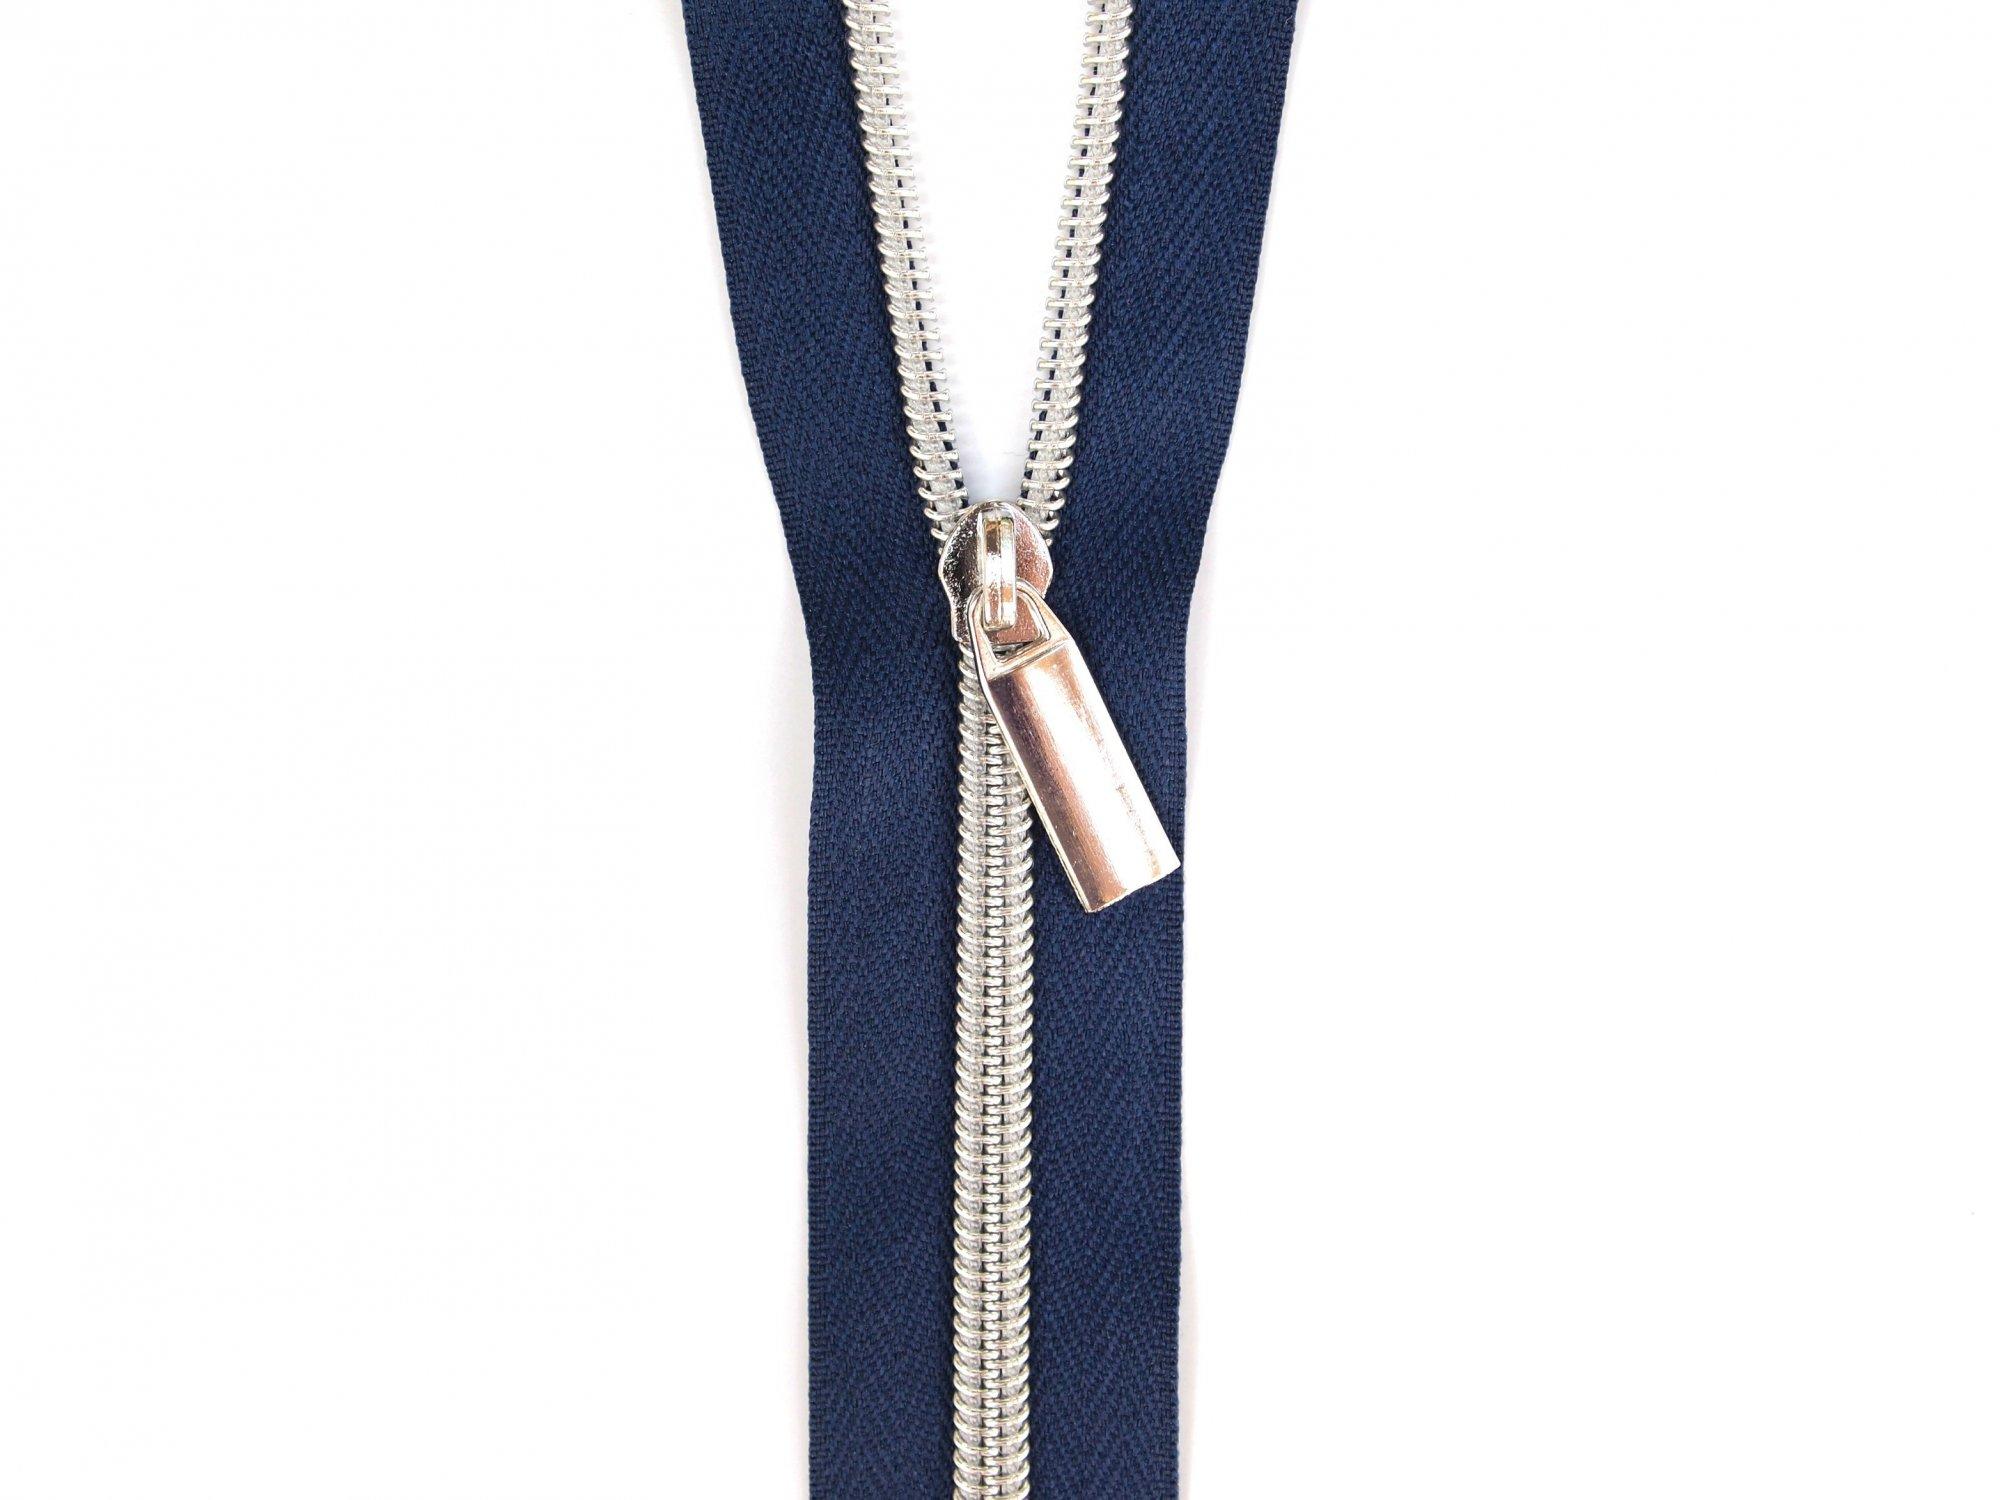 Zipper Tape - Navy Tape & Silver Zipper